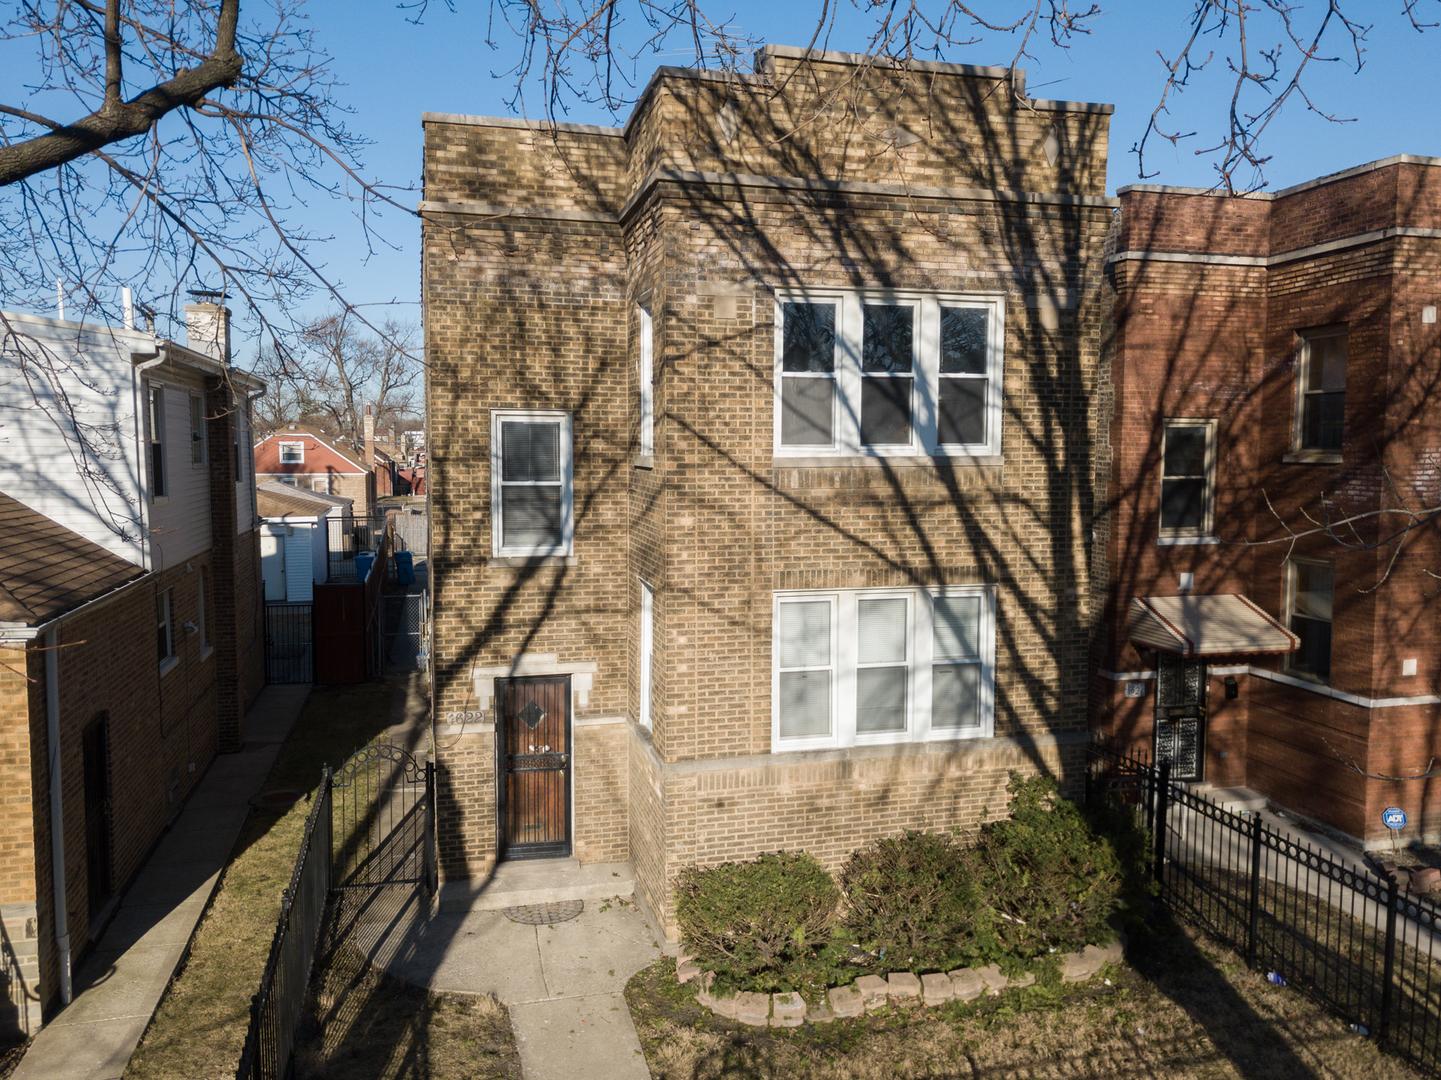 1622 Mayfield ,Chicago, Illinois 60639